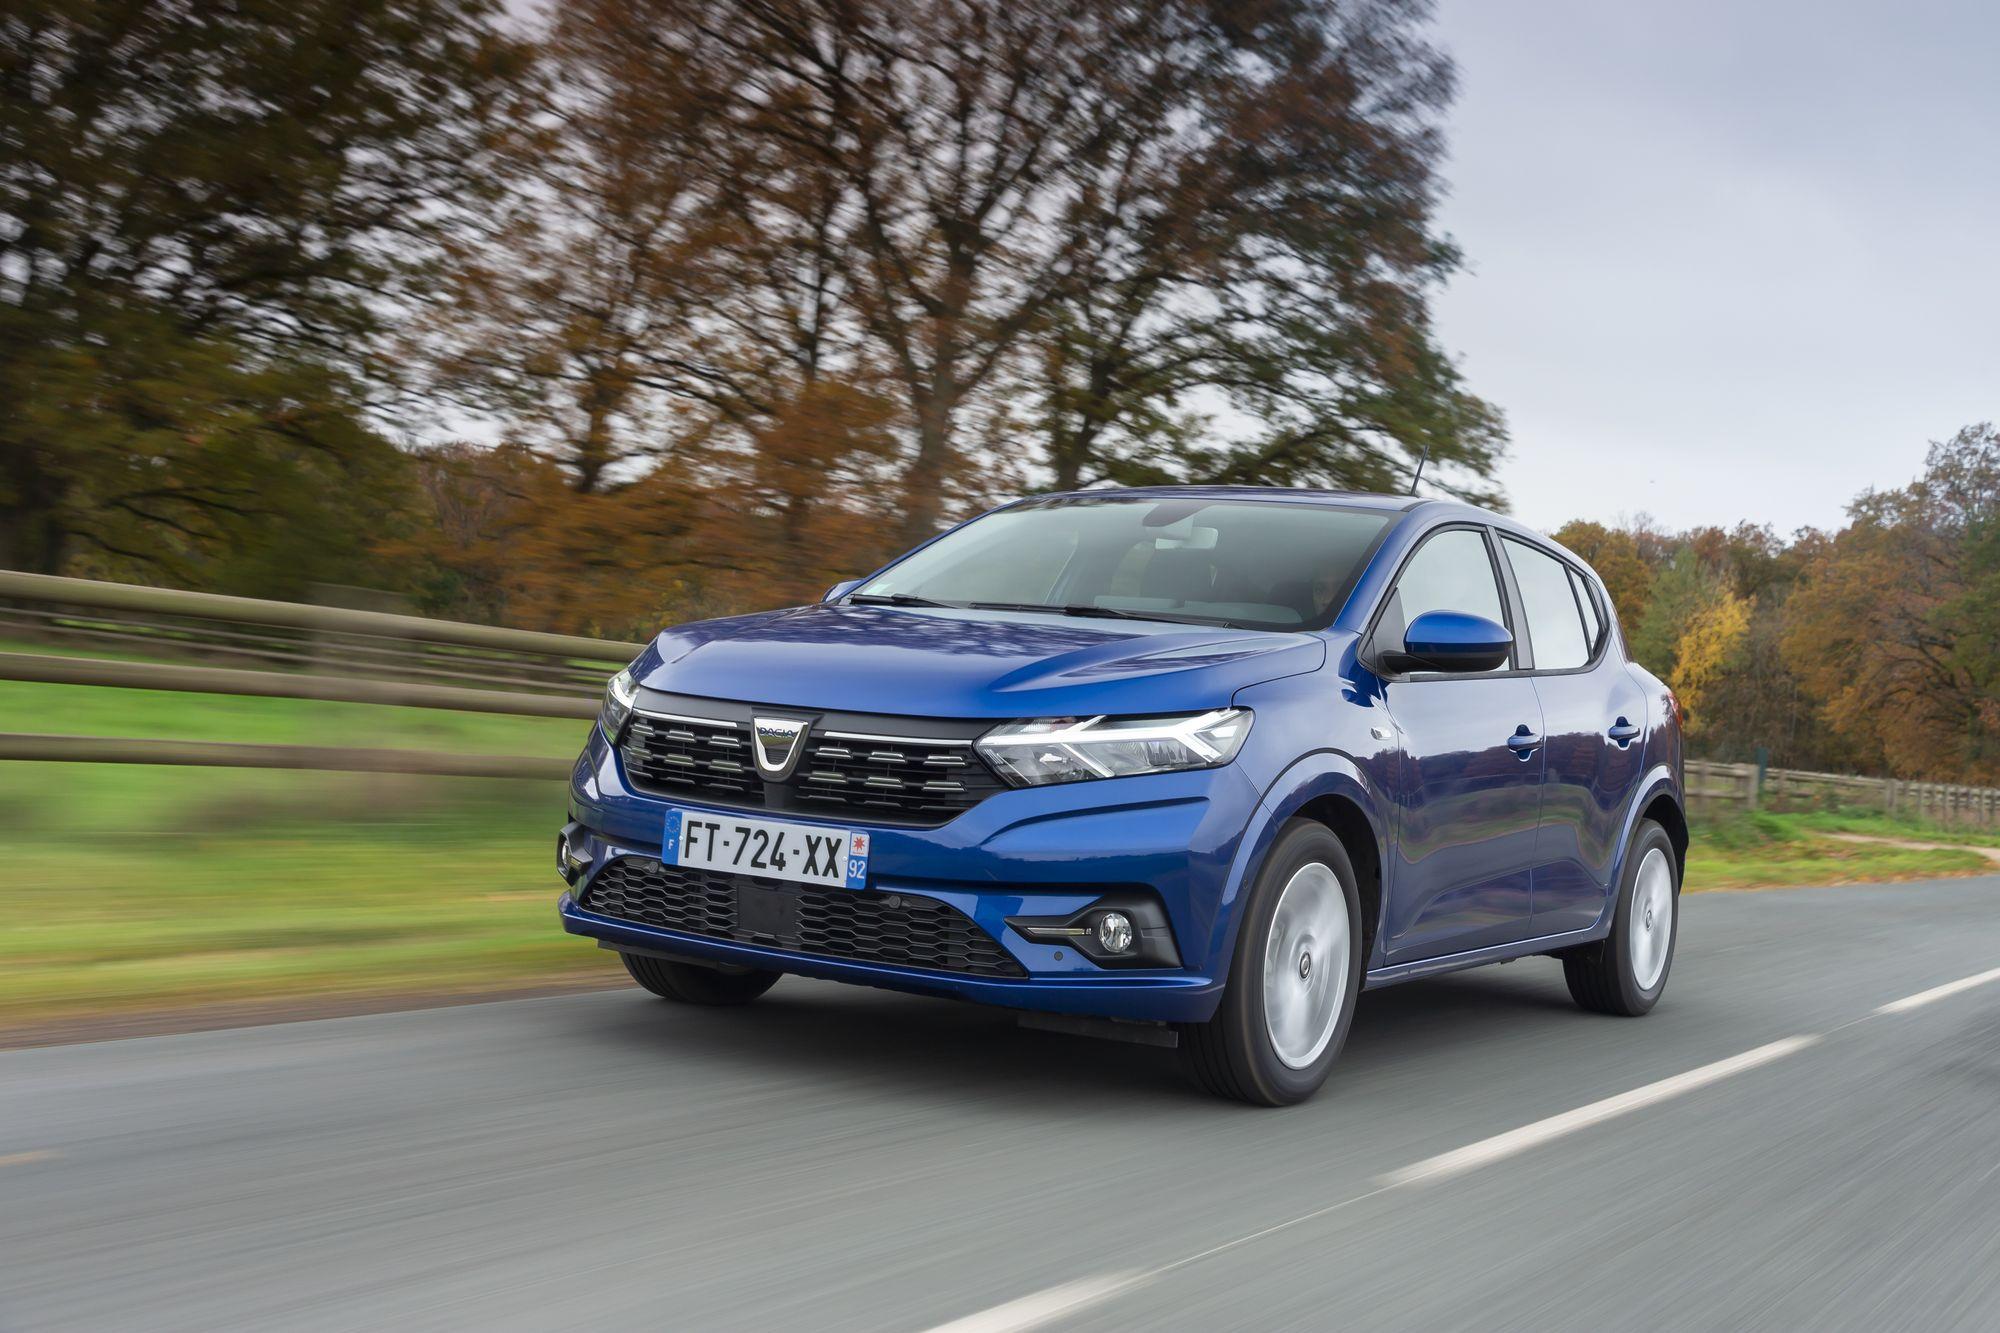 2020 - New Dacia SANDERO tests drive (2)_low